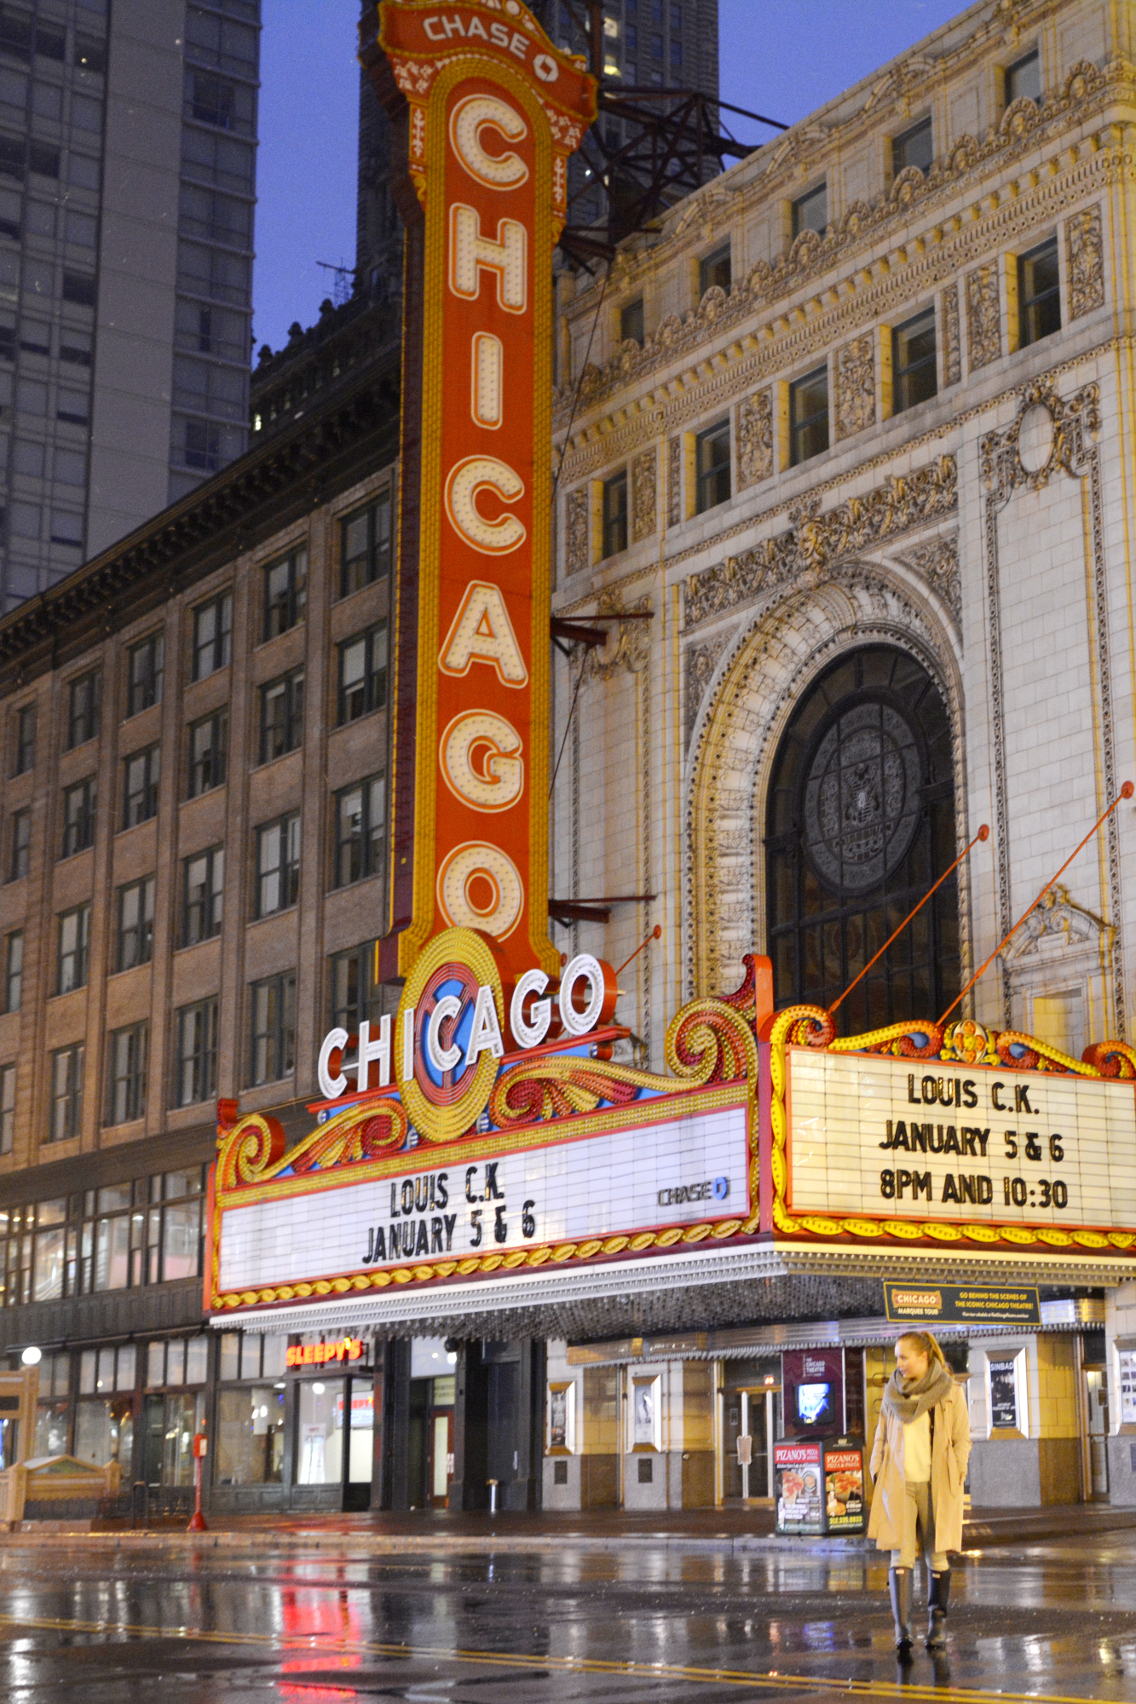 Chicago Theatre with Sed Bona 3